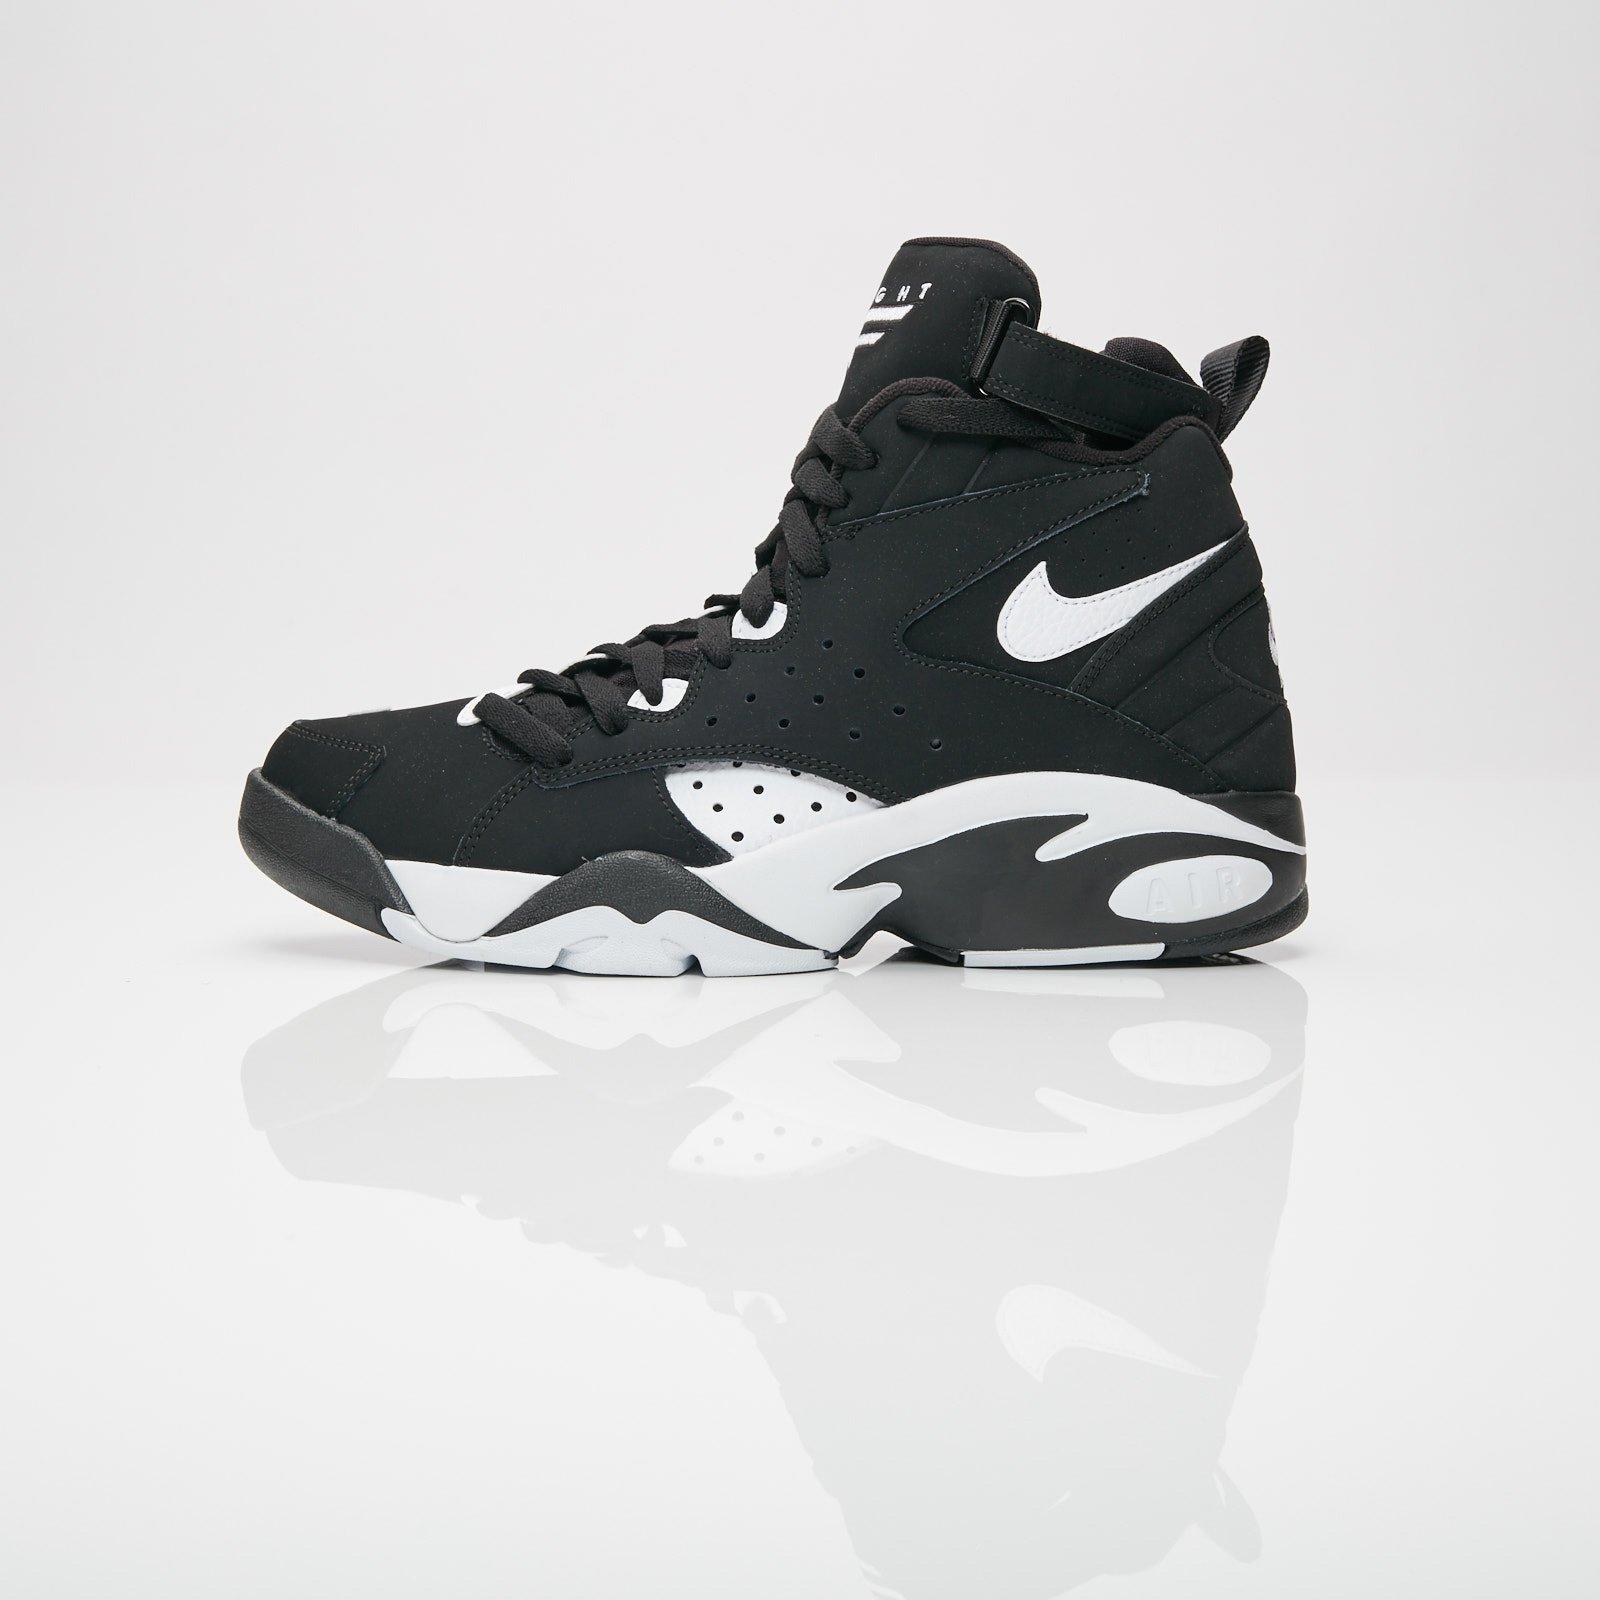 d34703cb3a51ef Nike Air Maestro II LTD - Ah8511-001 - Sneakersnstuff